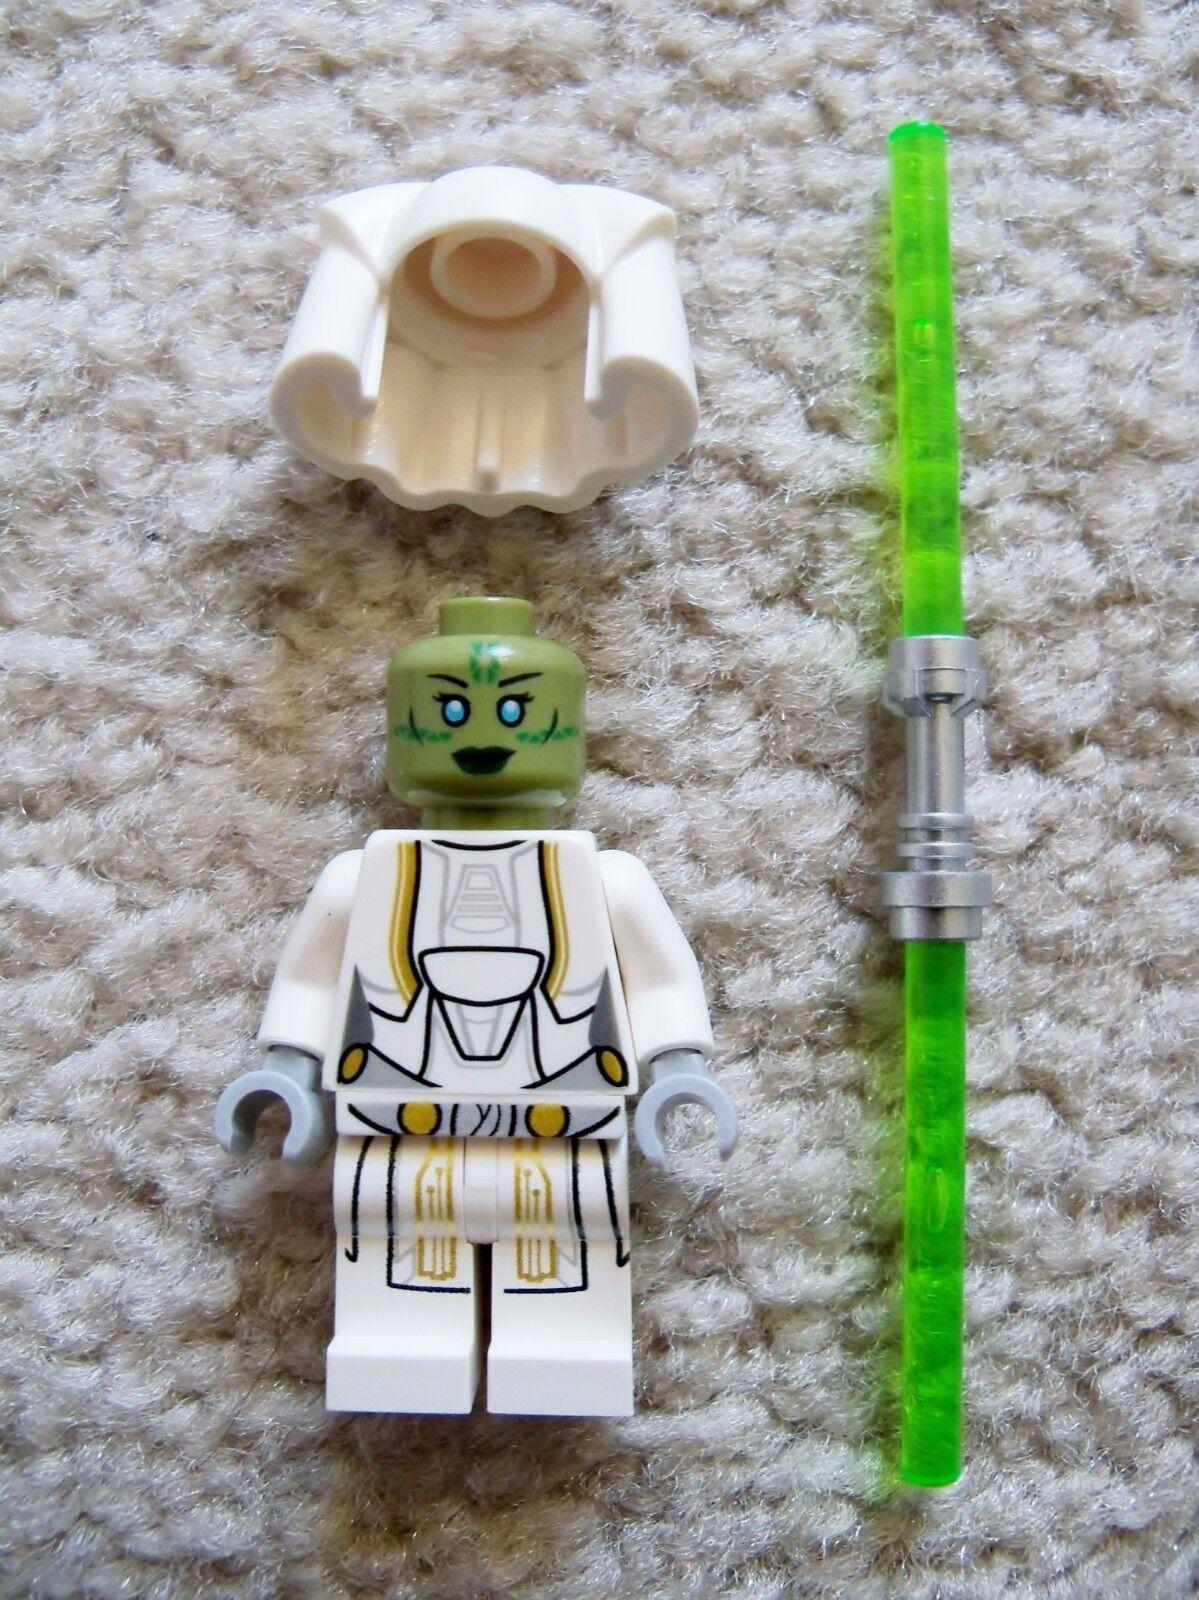 LEGO Star Wars Old Republic - Rare - Jedi Consular Consular Consular - From 75025 - New 7d6080